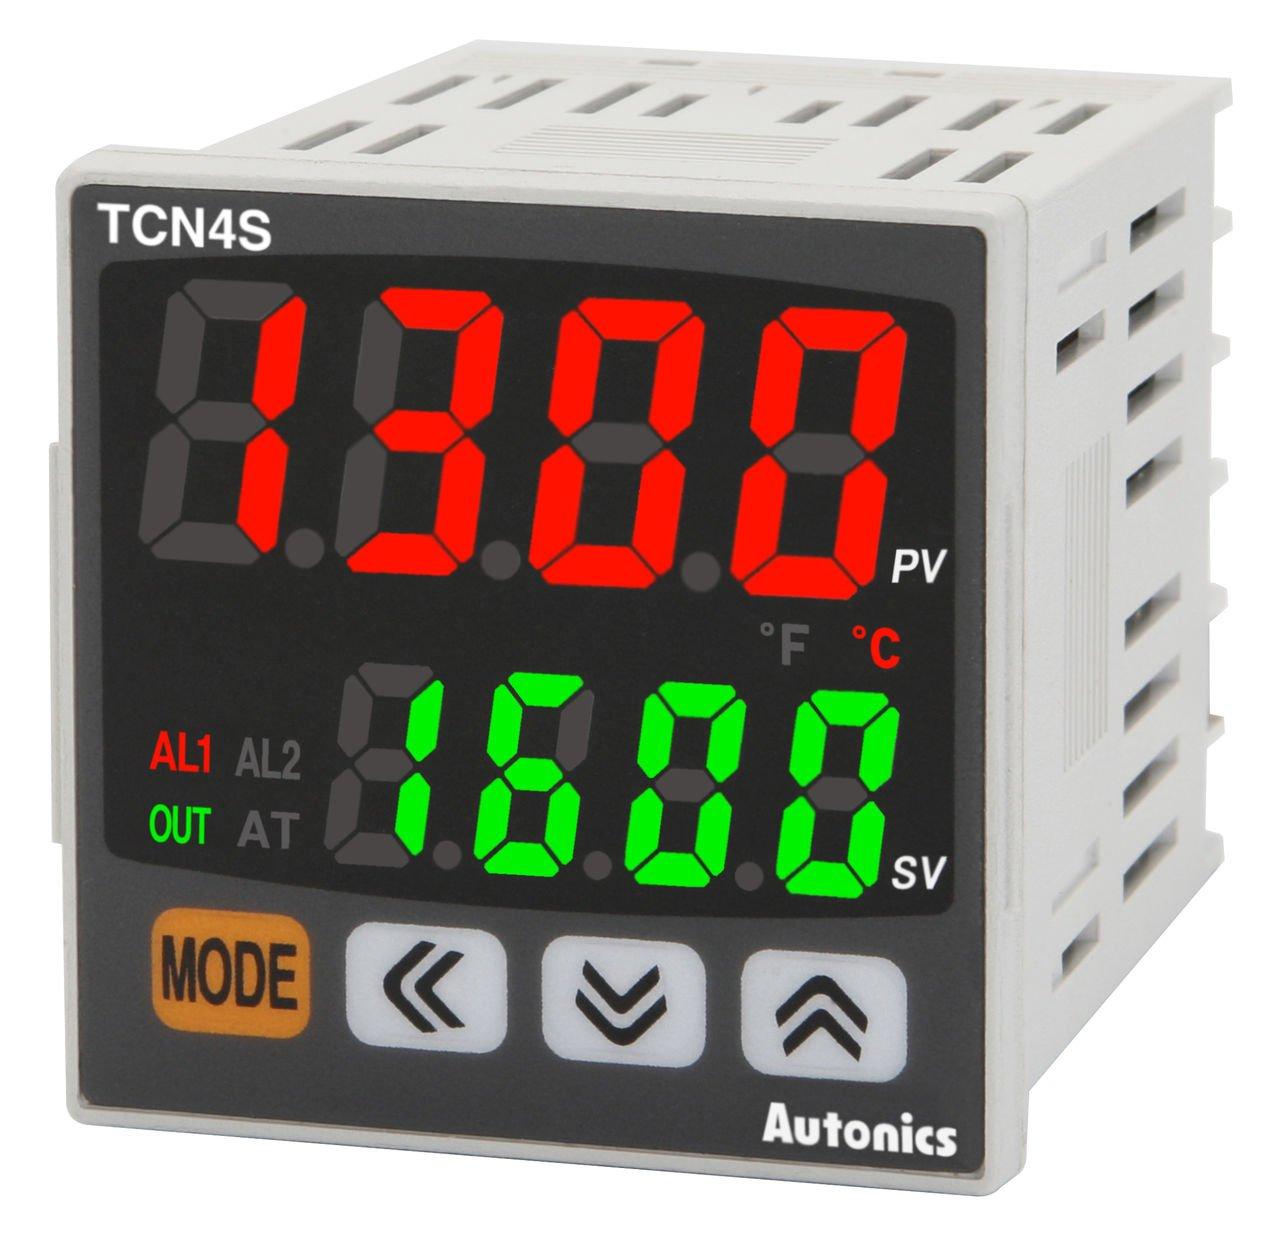 Autonics TCN4S-22R Temp Control, 1/16 DIN, Dual display 4 Digit, PID Control, Relay & SSR Output, 2 Alarm Output, 24VAC/24-48VDC